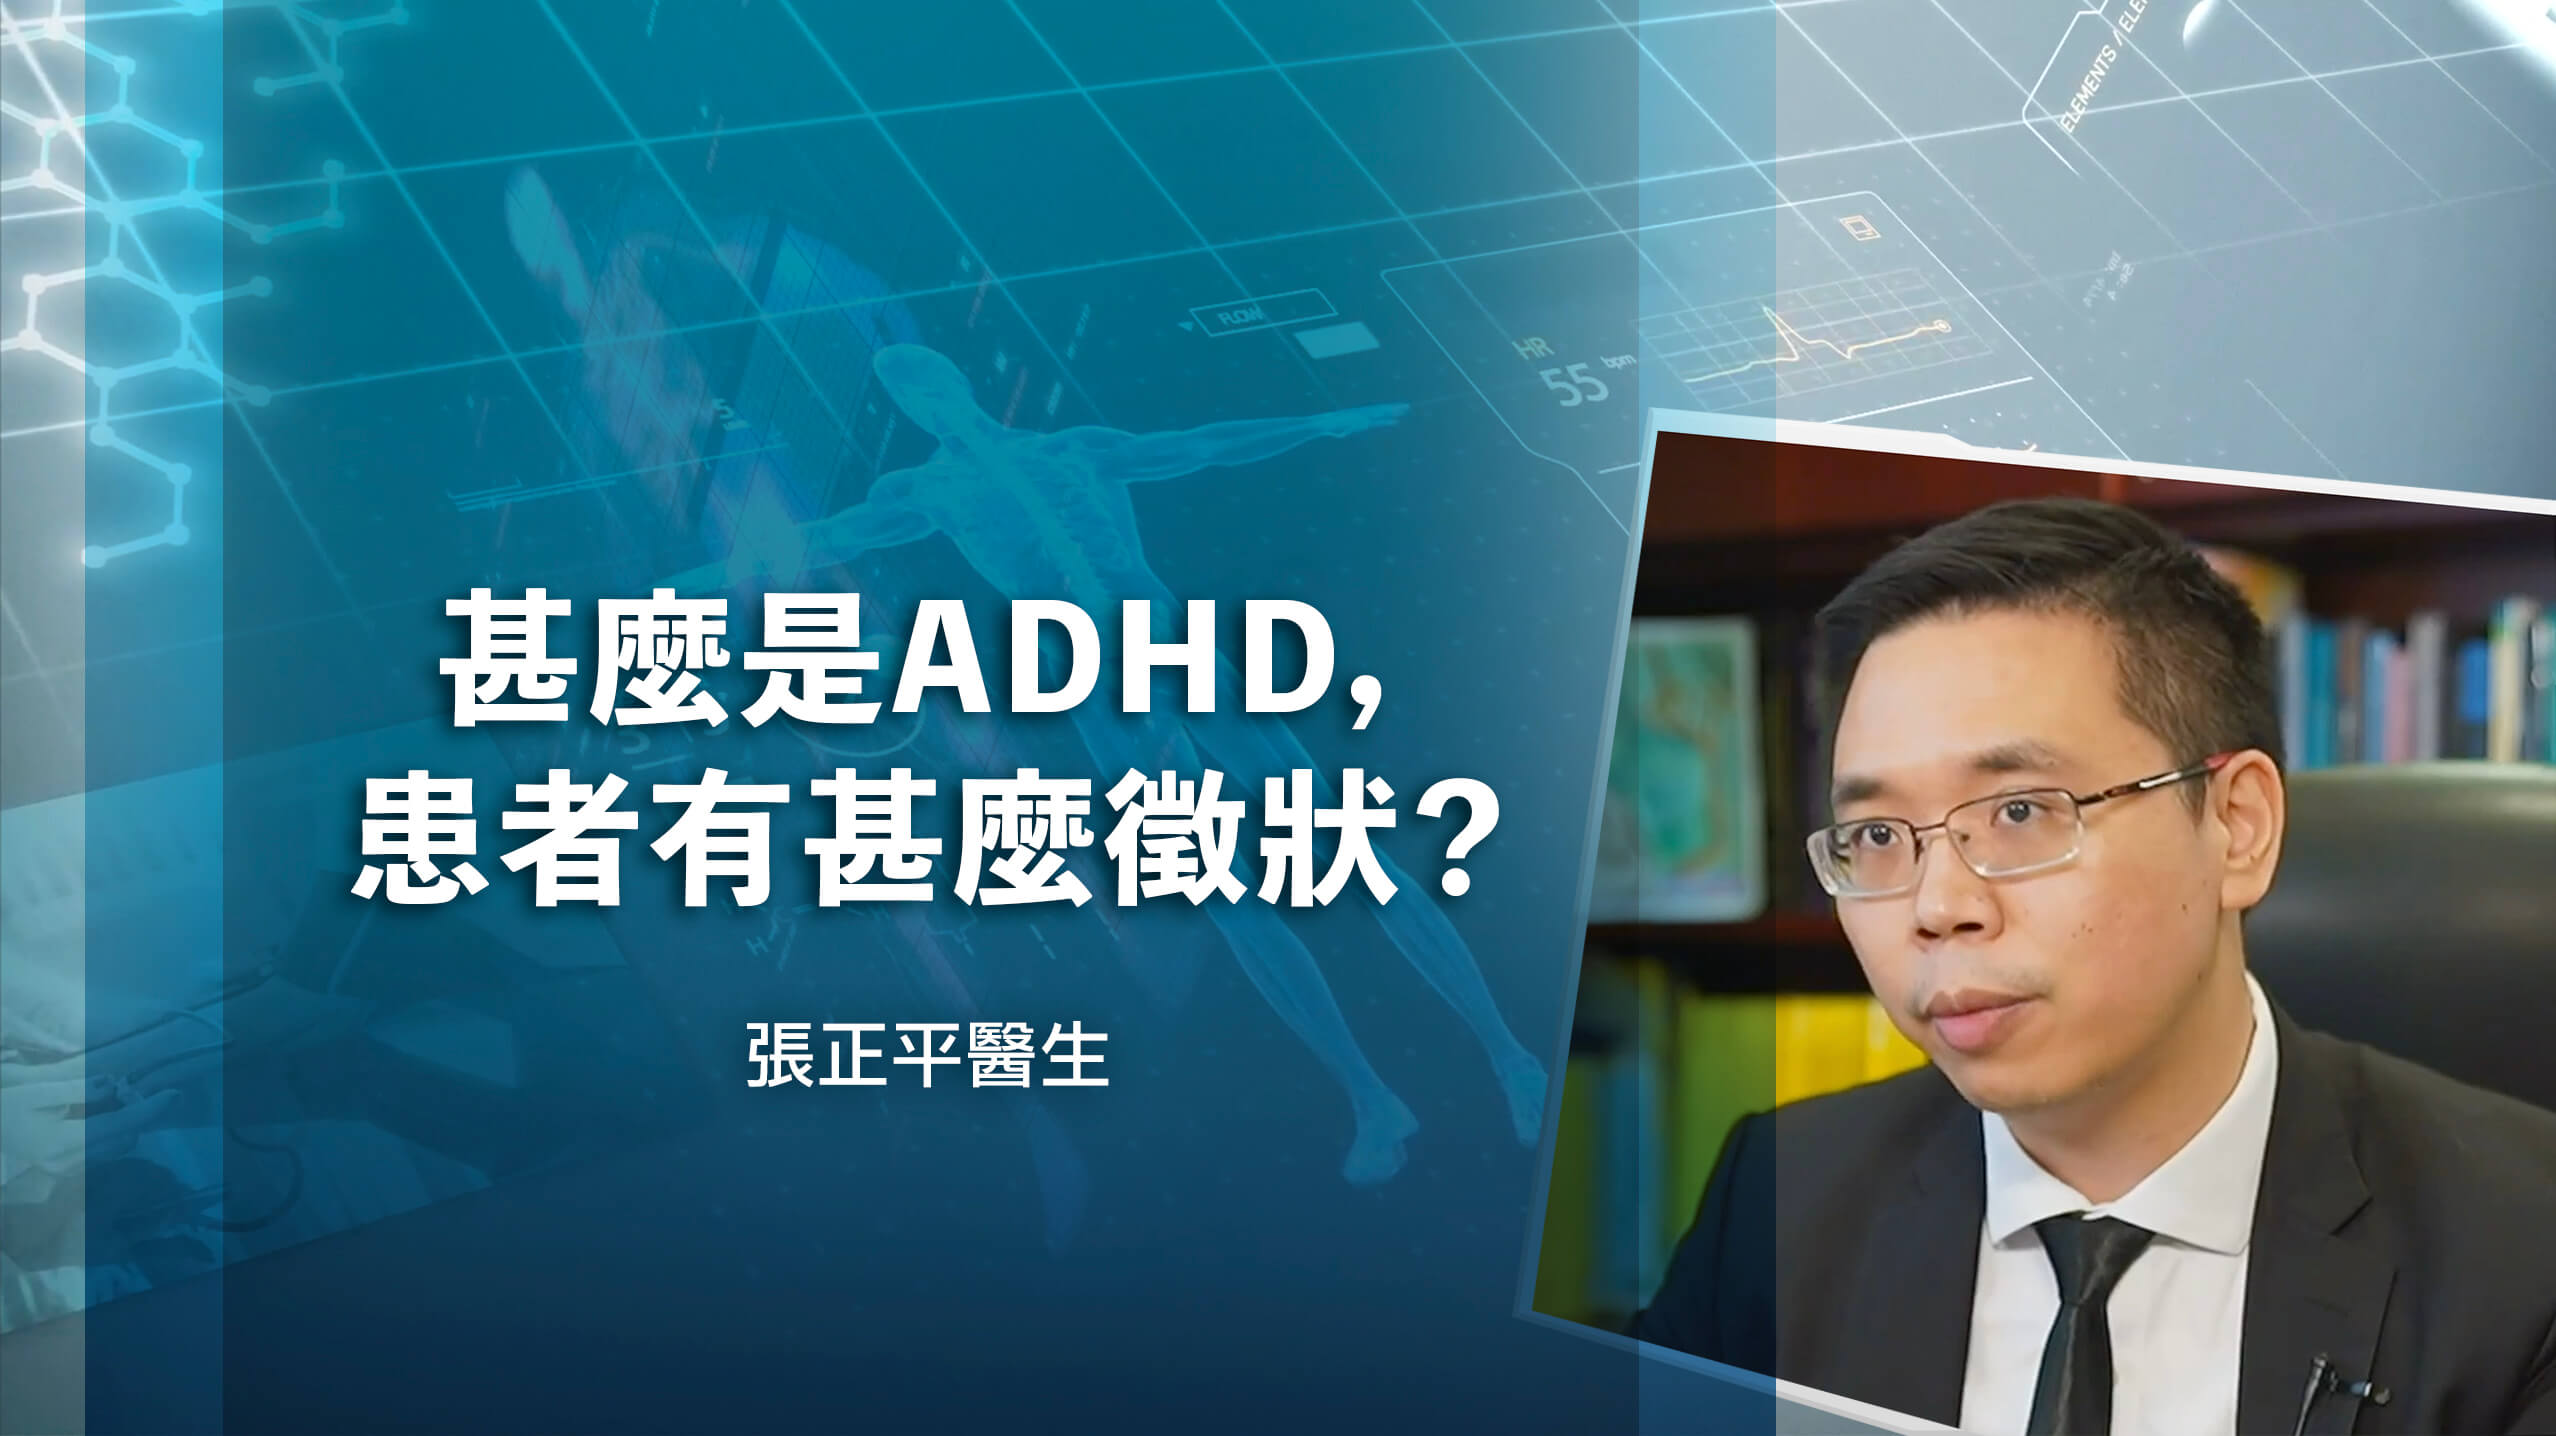 【ADHD】